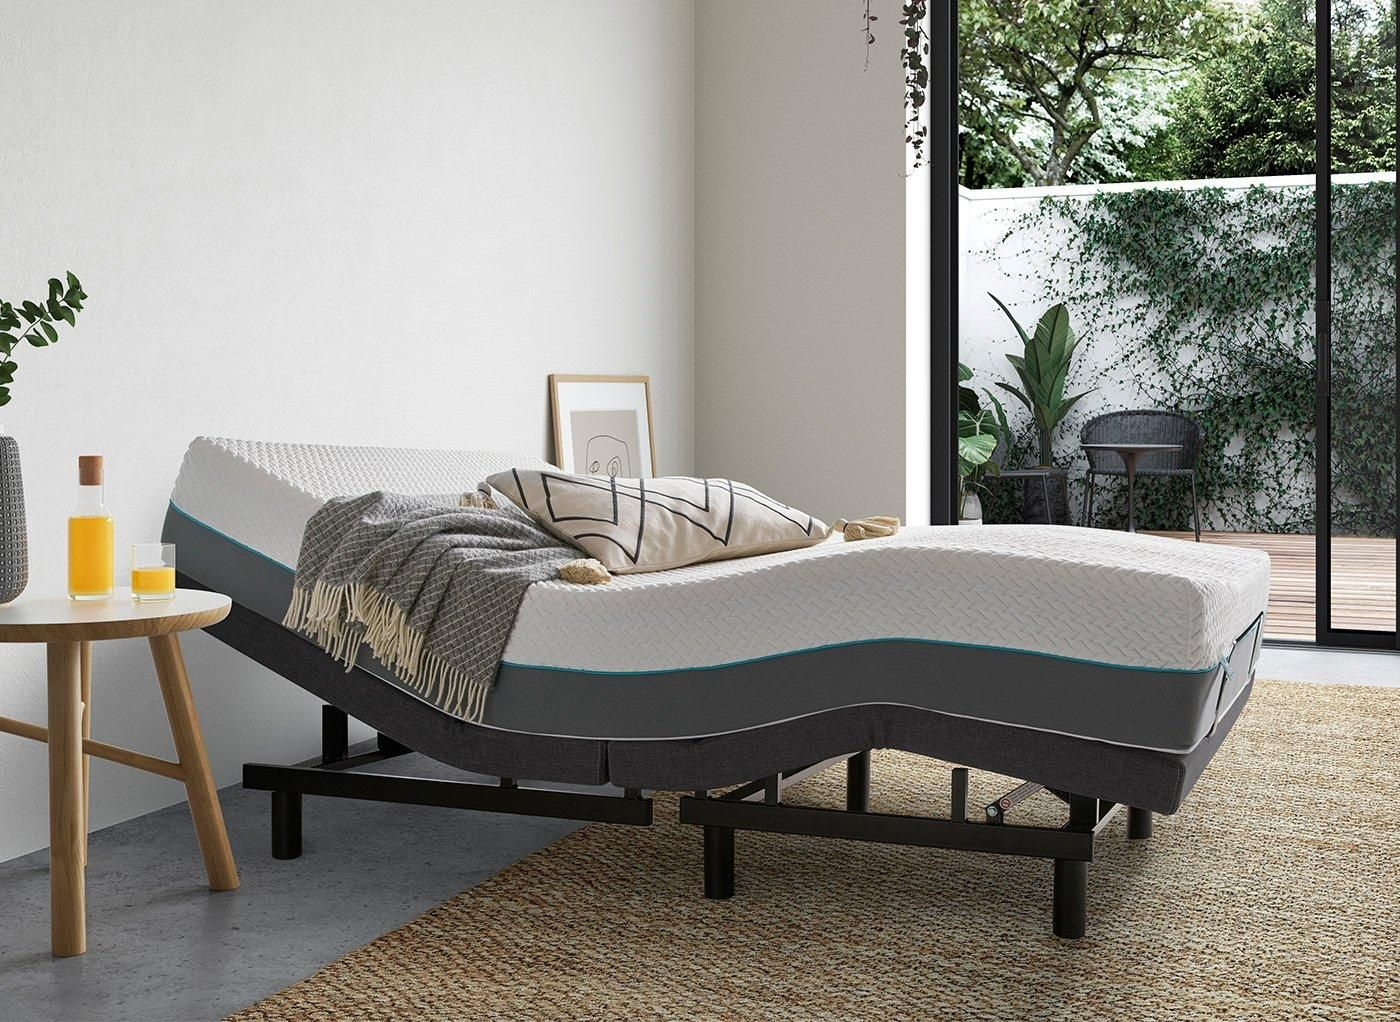 Sleepmotion 200i Adjustable Bed Frame 5 0 King Grey In 2020 Adjustable Bed Frame Adjustable Beds Bed Frame